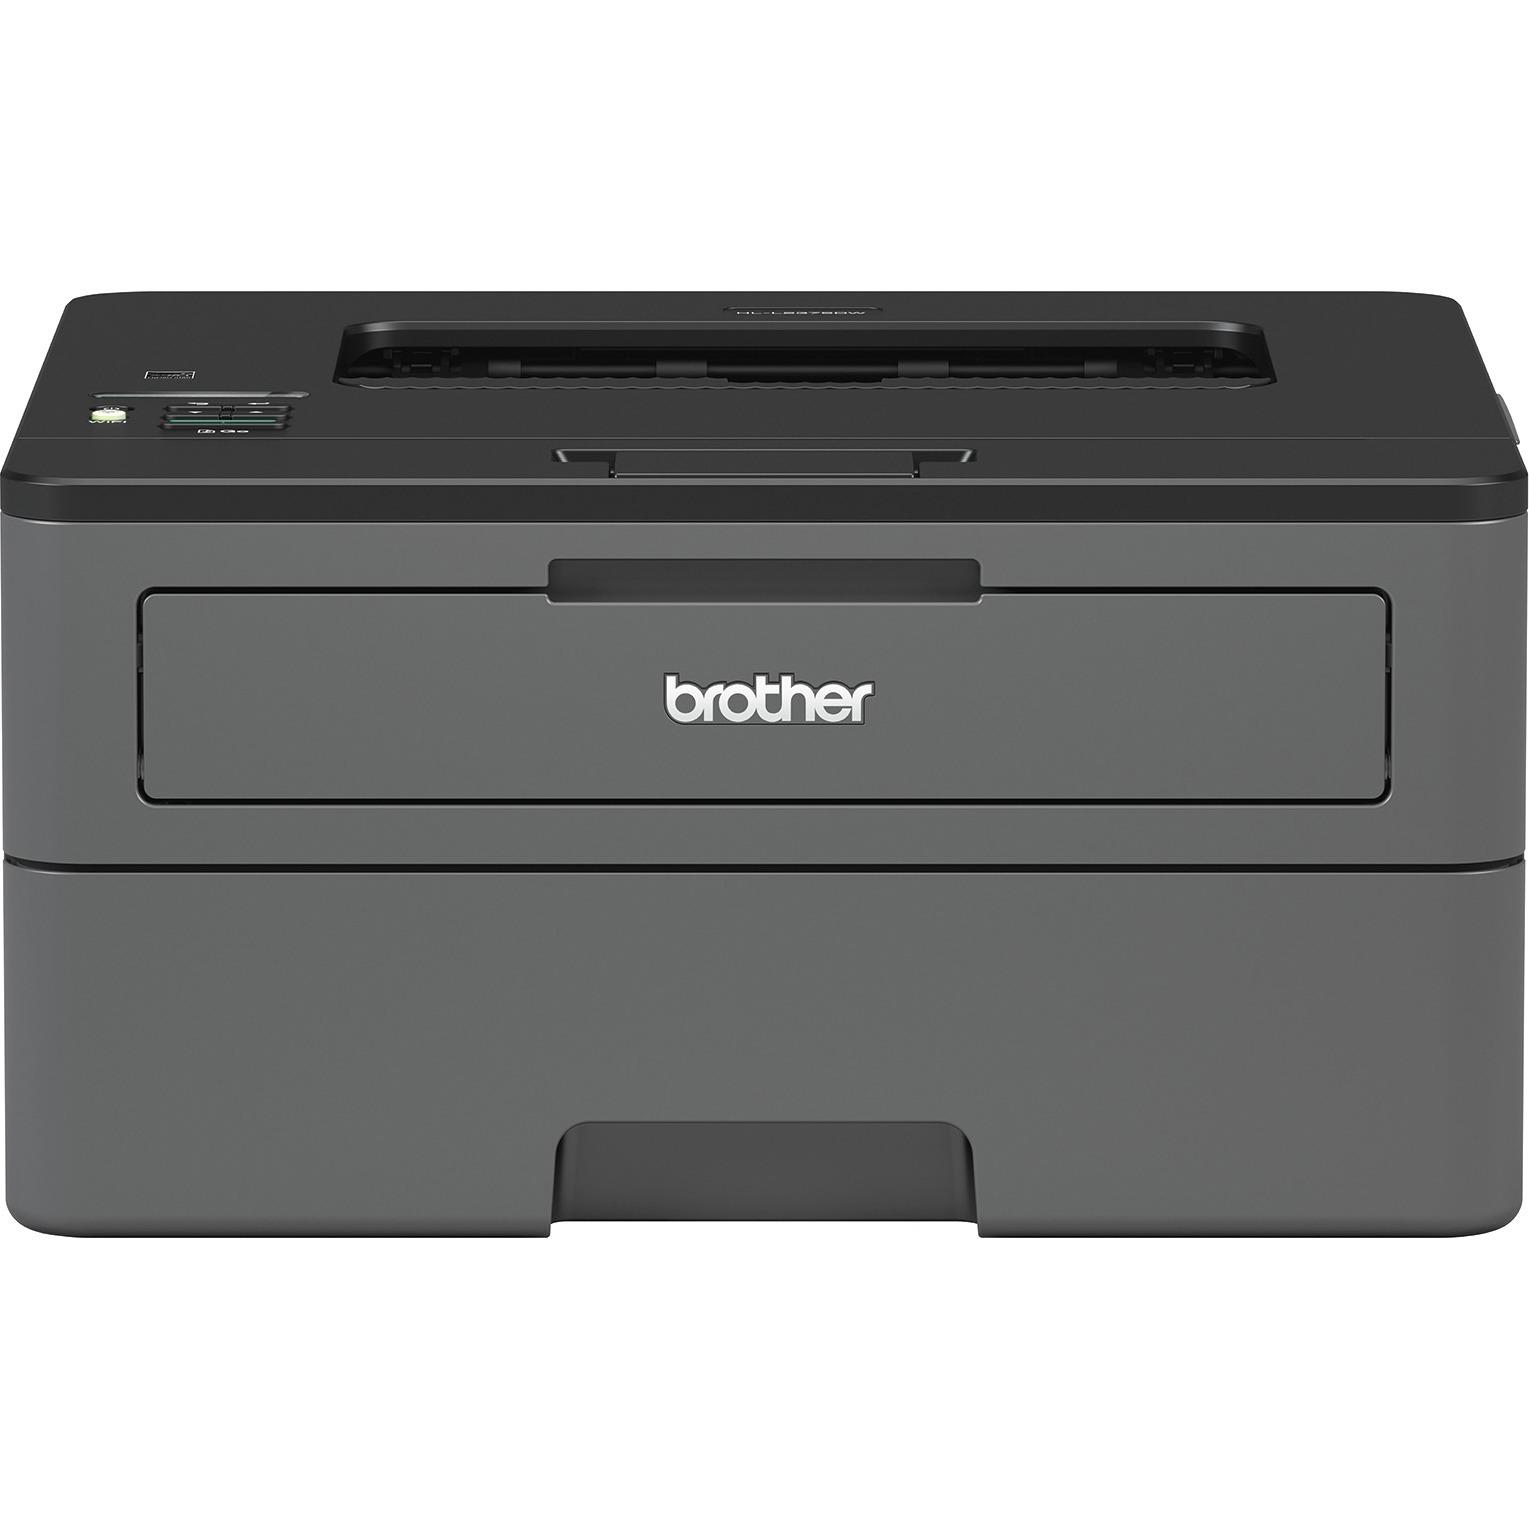 Brother HL-L2375DW Laser Printer - Monochrome - 2400 x 600 dpi Print